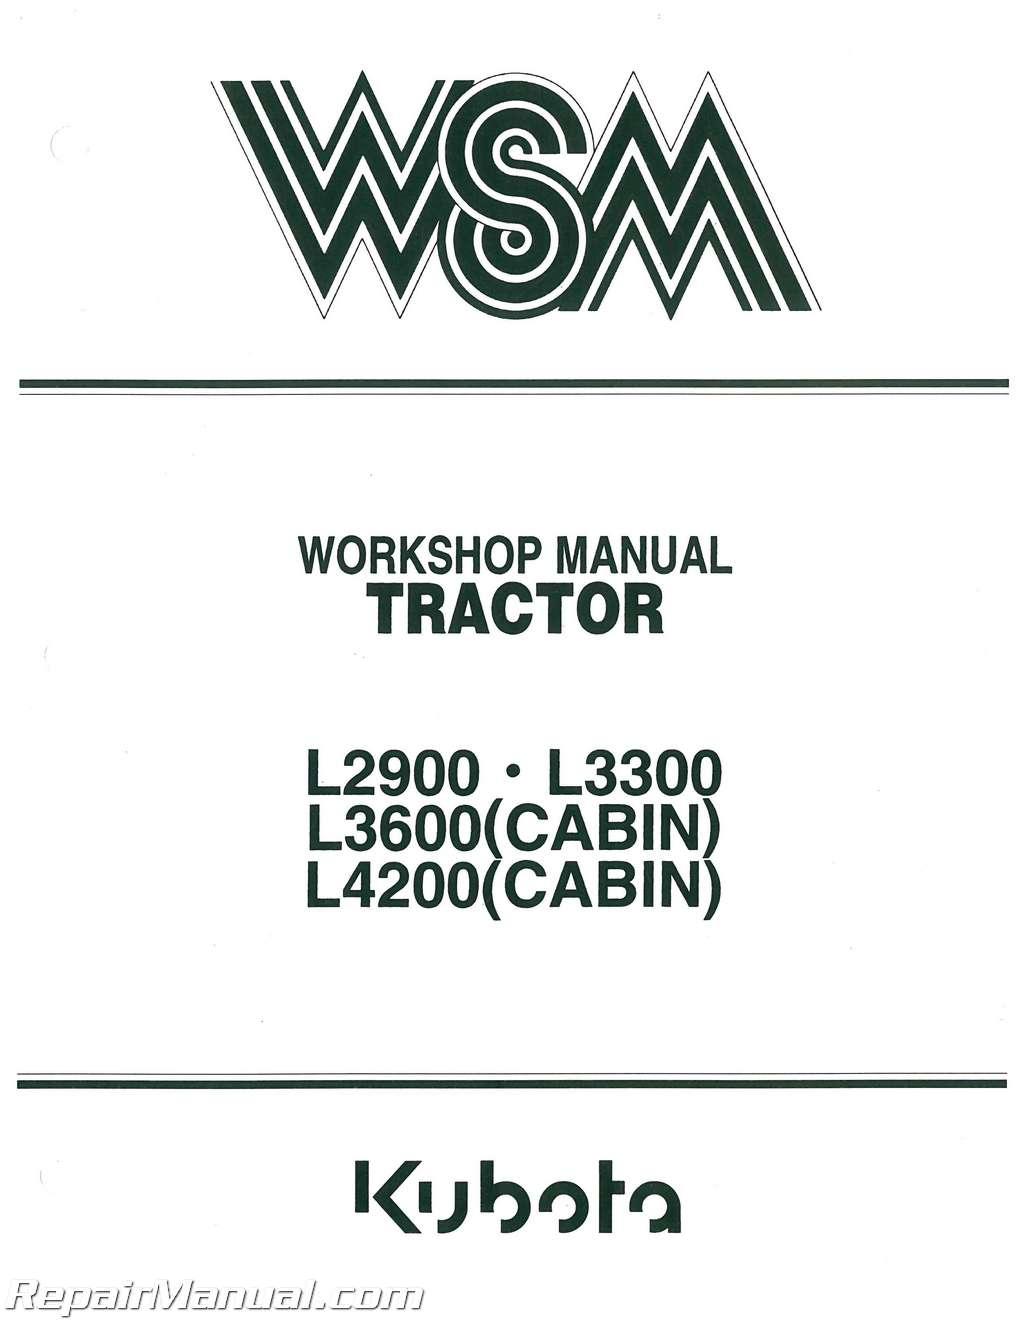 Kubota L260 Wiring Diagram 26 Images Online Tractor Manuals Repair L2900 L3300 L3600 L4200 Diesel 2 4wd Service Manual